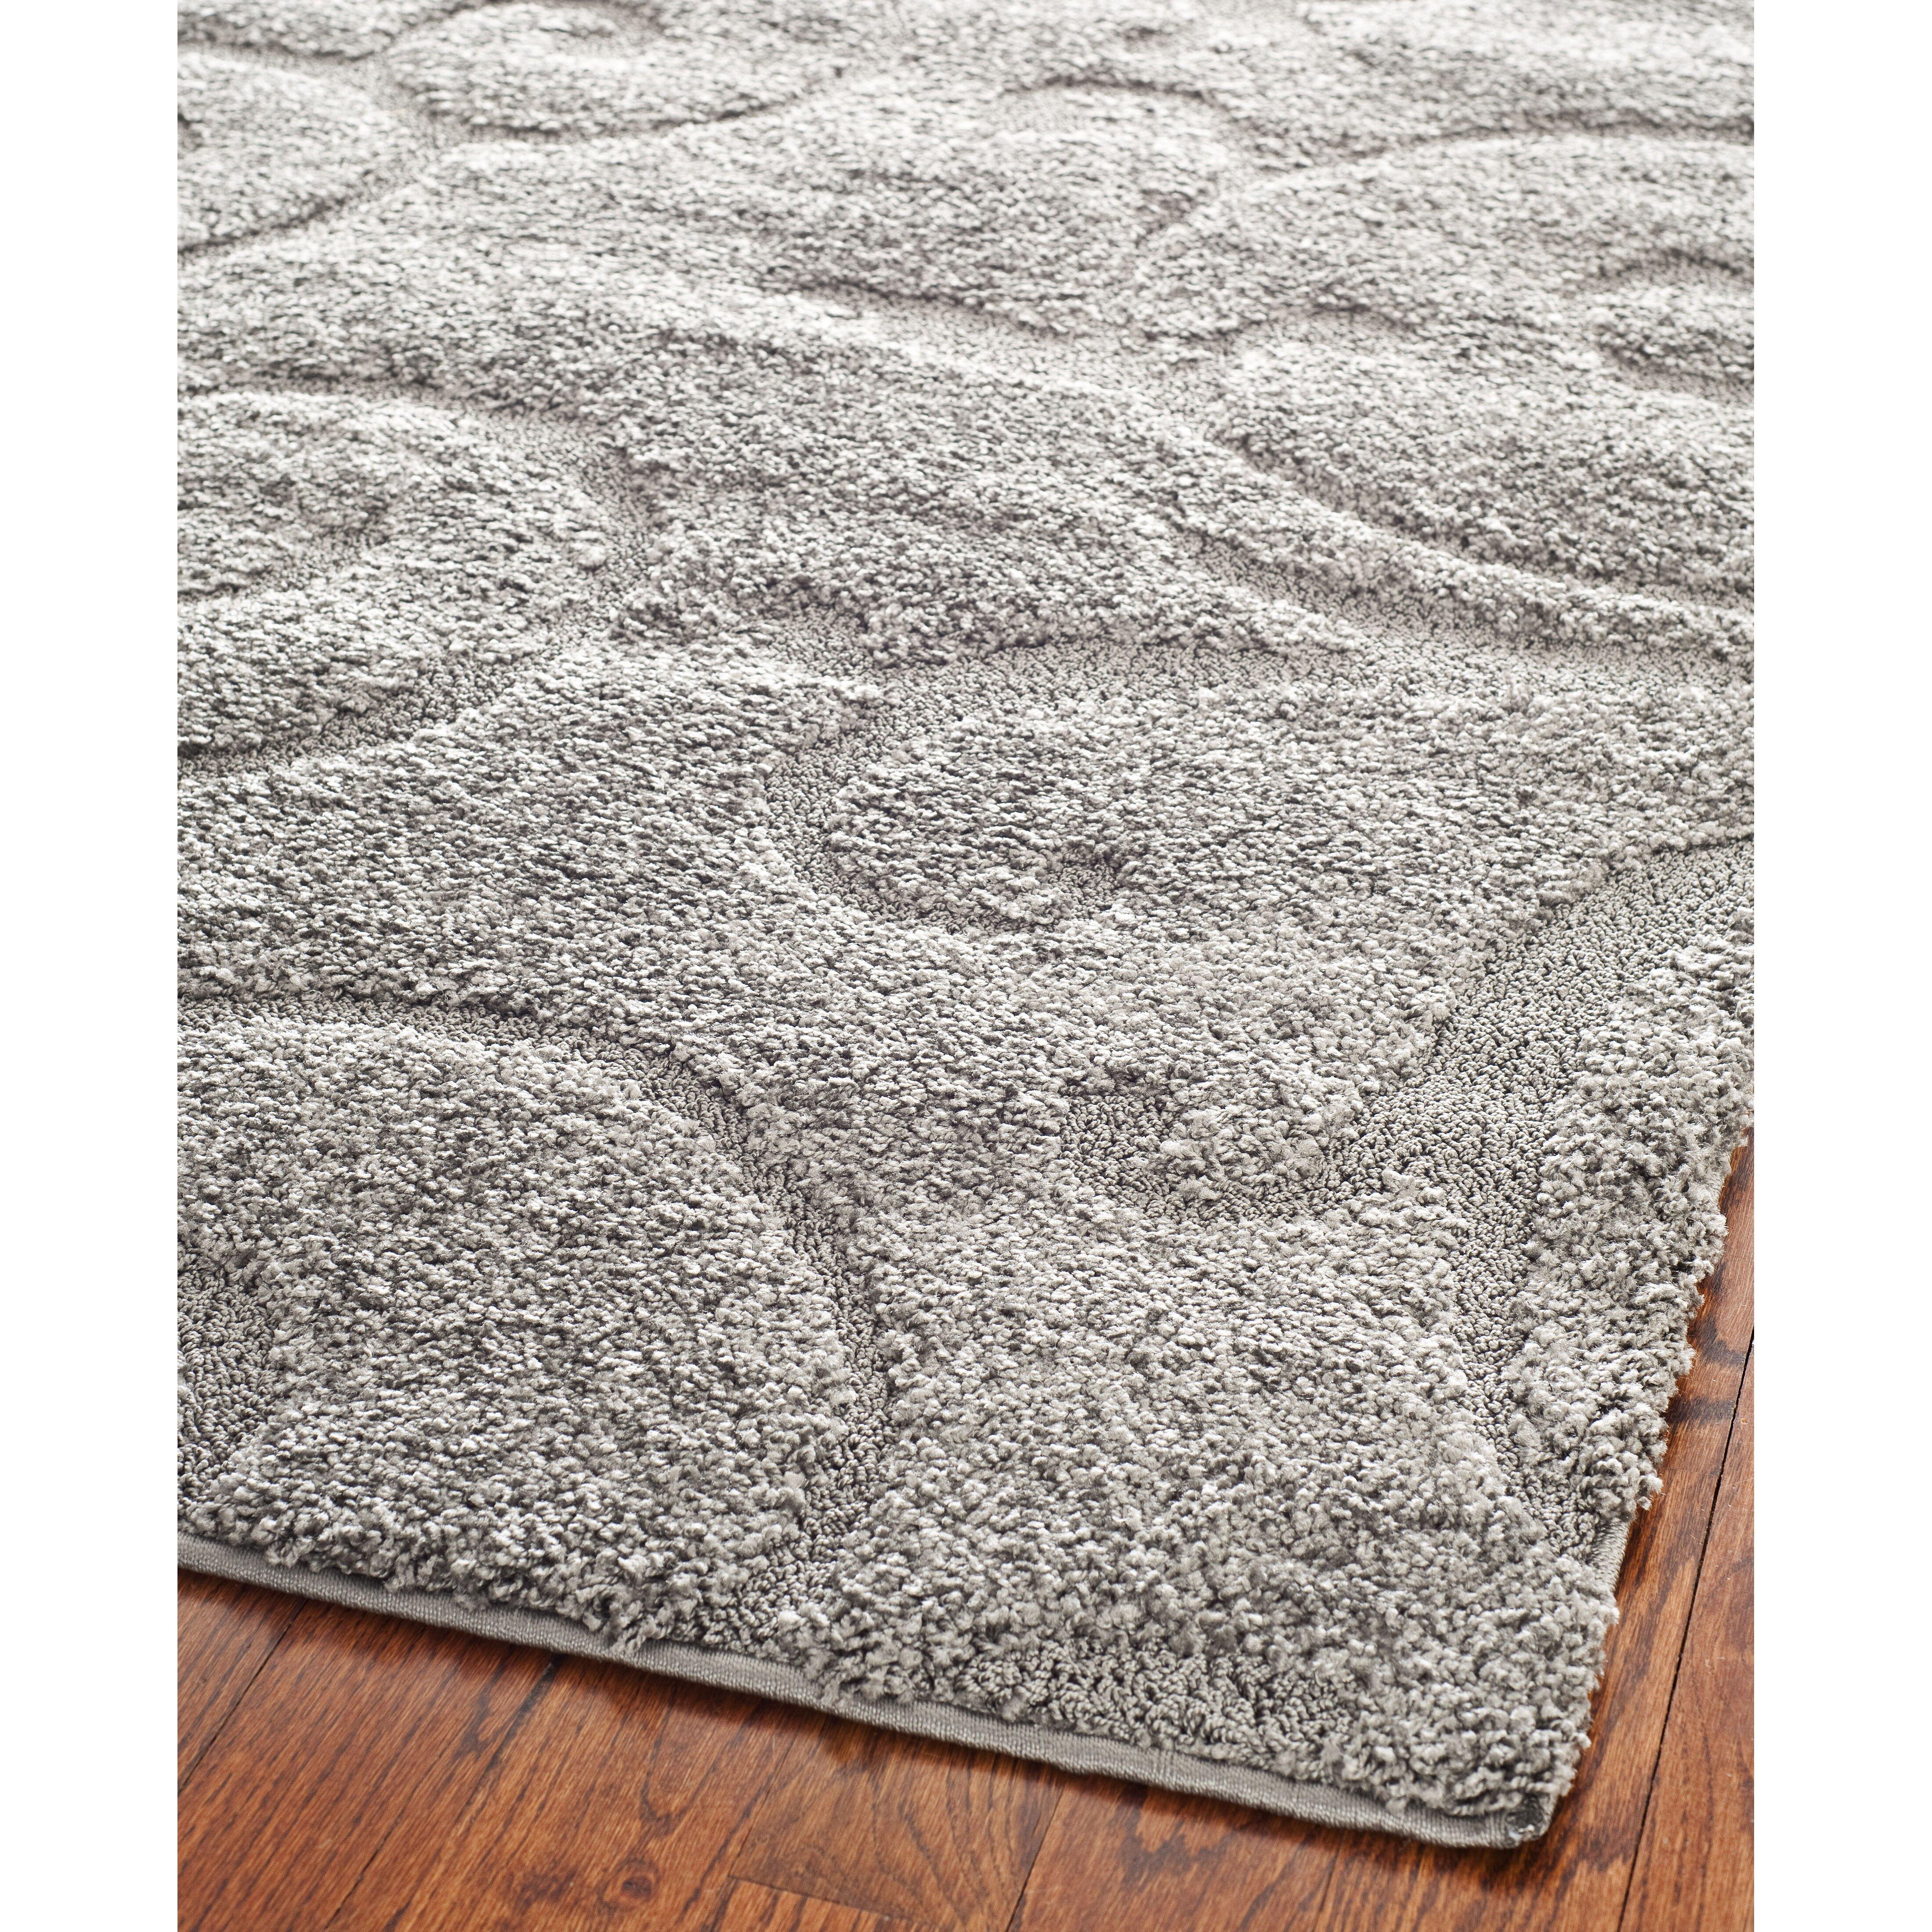 charlton home rowes swirl gray area rug reviews wayfair